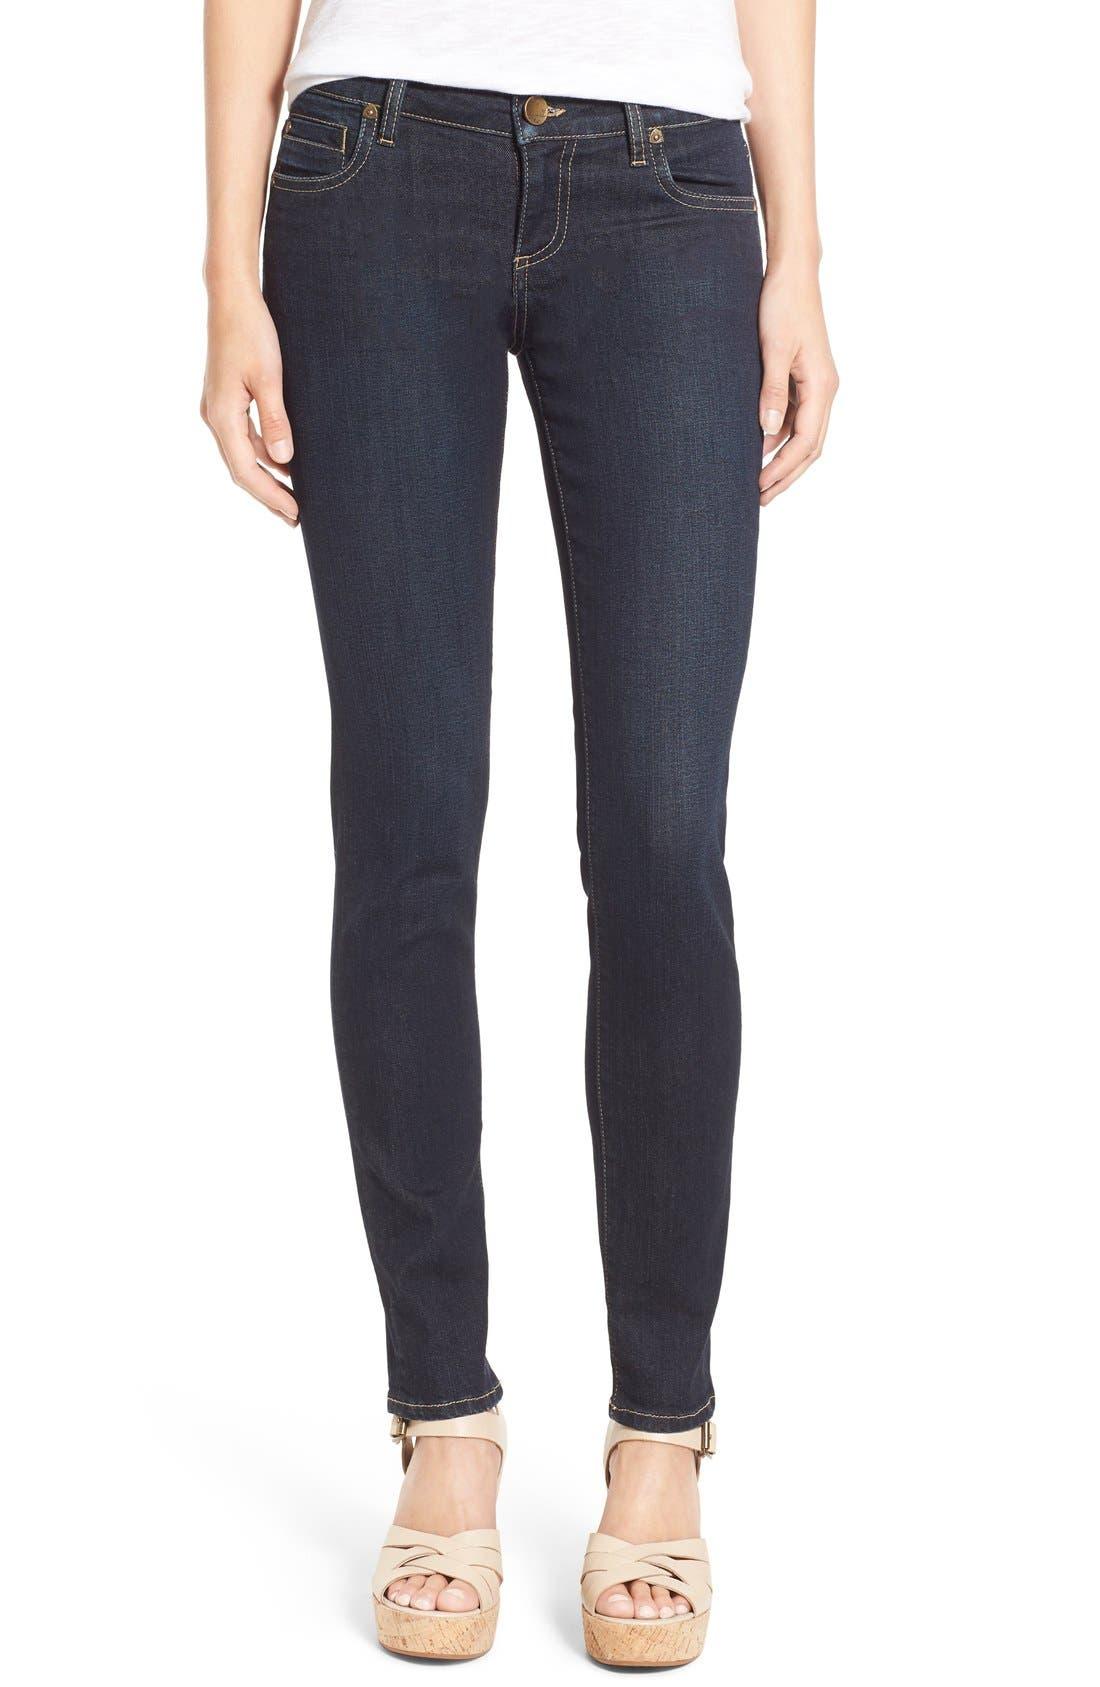 Alternate Image 4  - KUT from the Kloth 'Catherine' Slim Boyfriend Jeans (Limitless) (Petite)